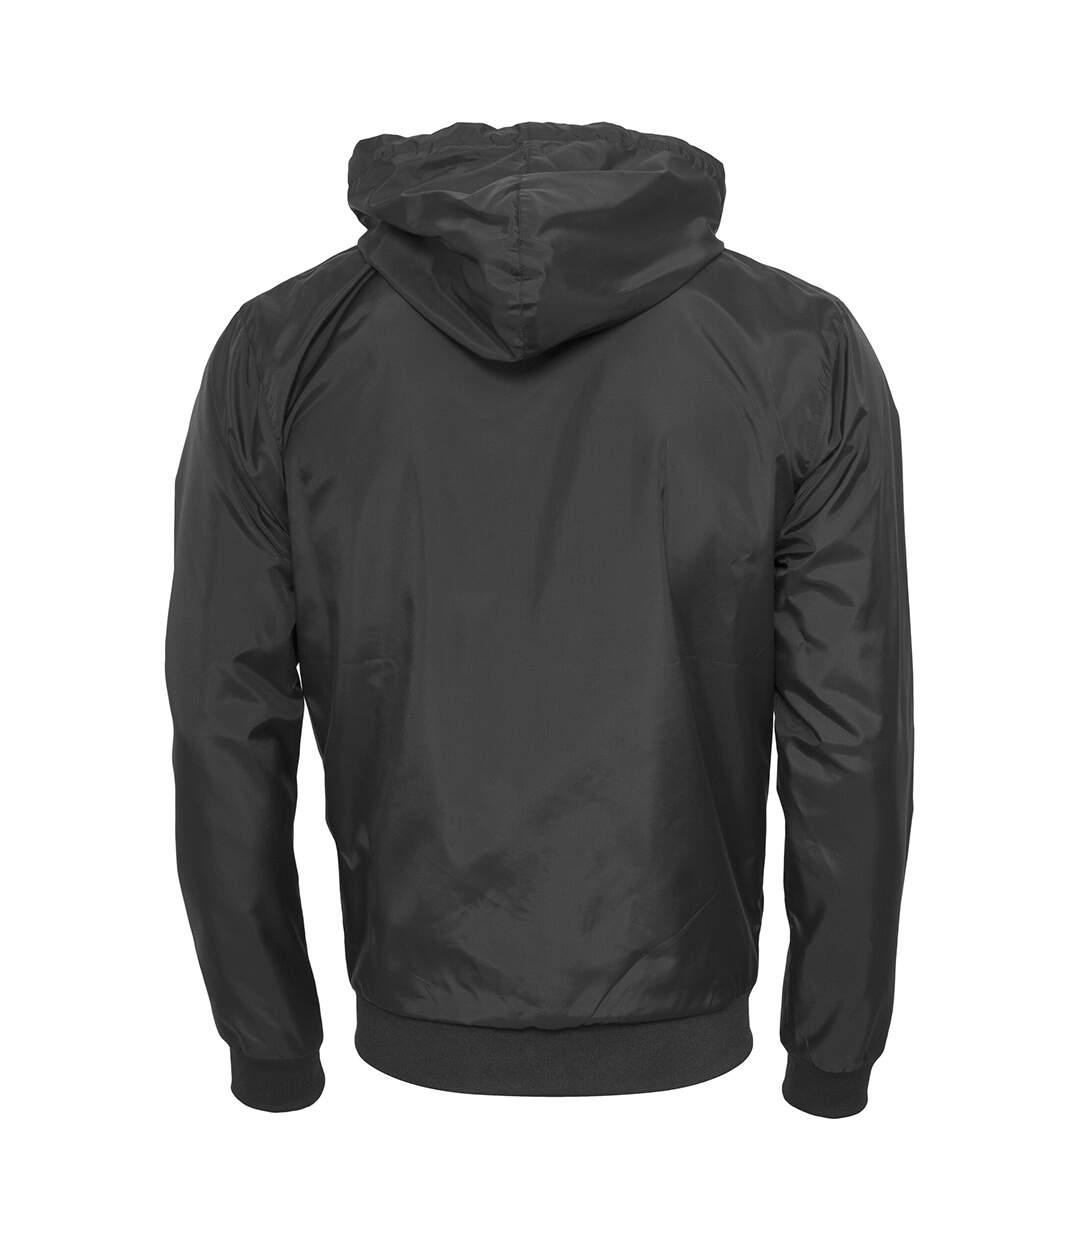 Build Your Brand Mens Zip Up Wind Runner Jacket (Black/White) - UTRW5676